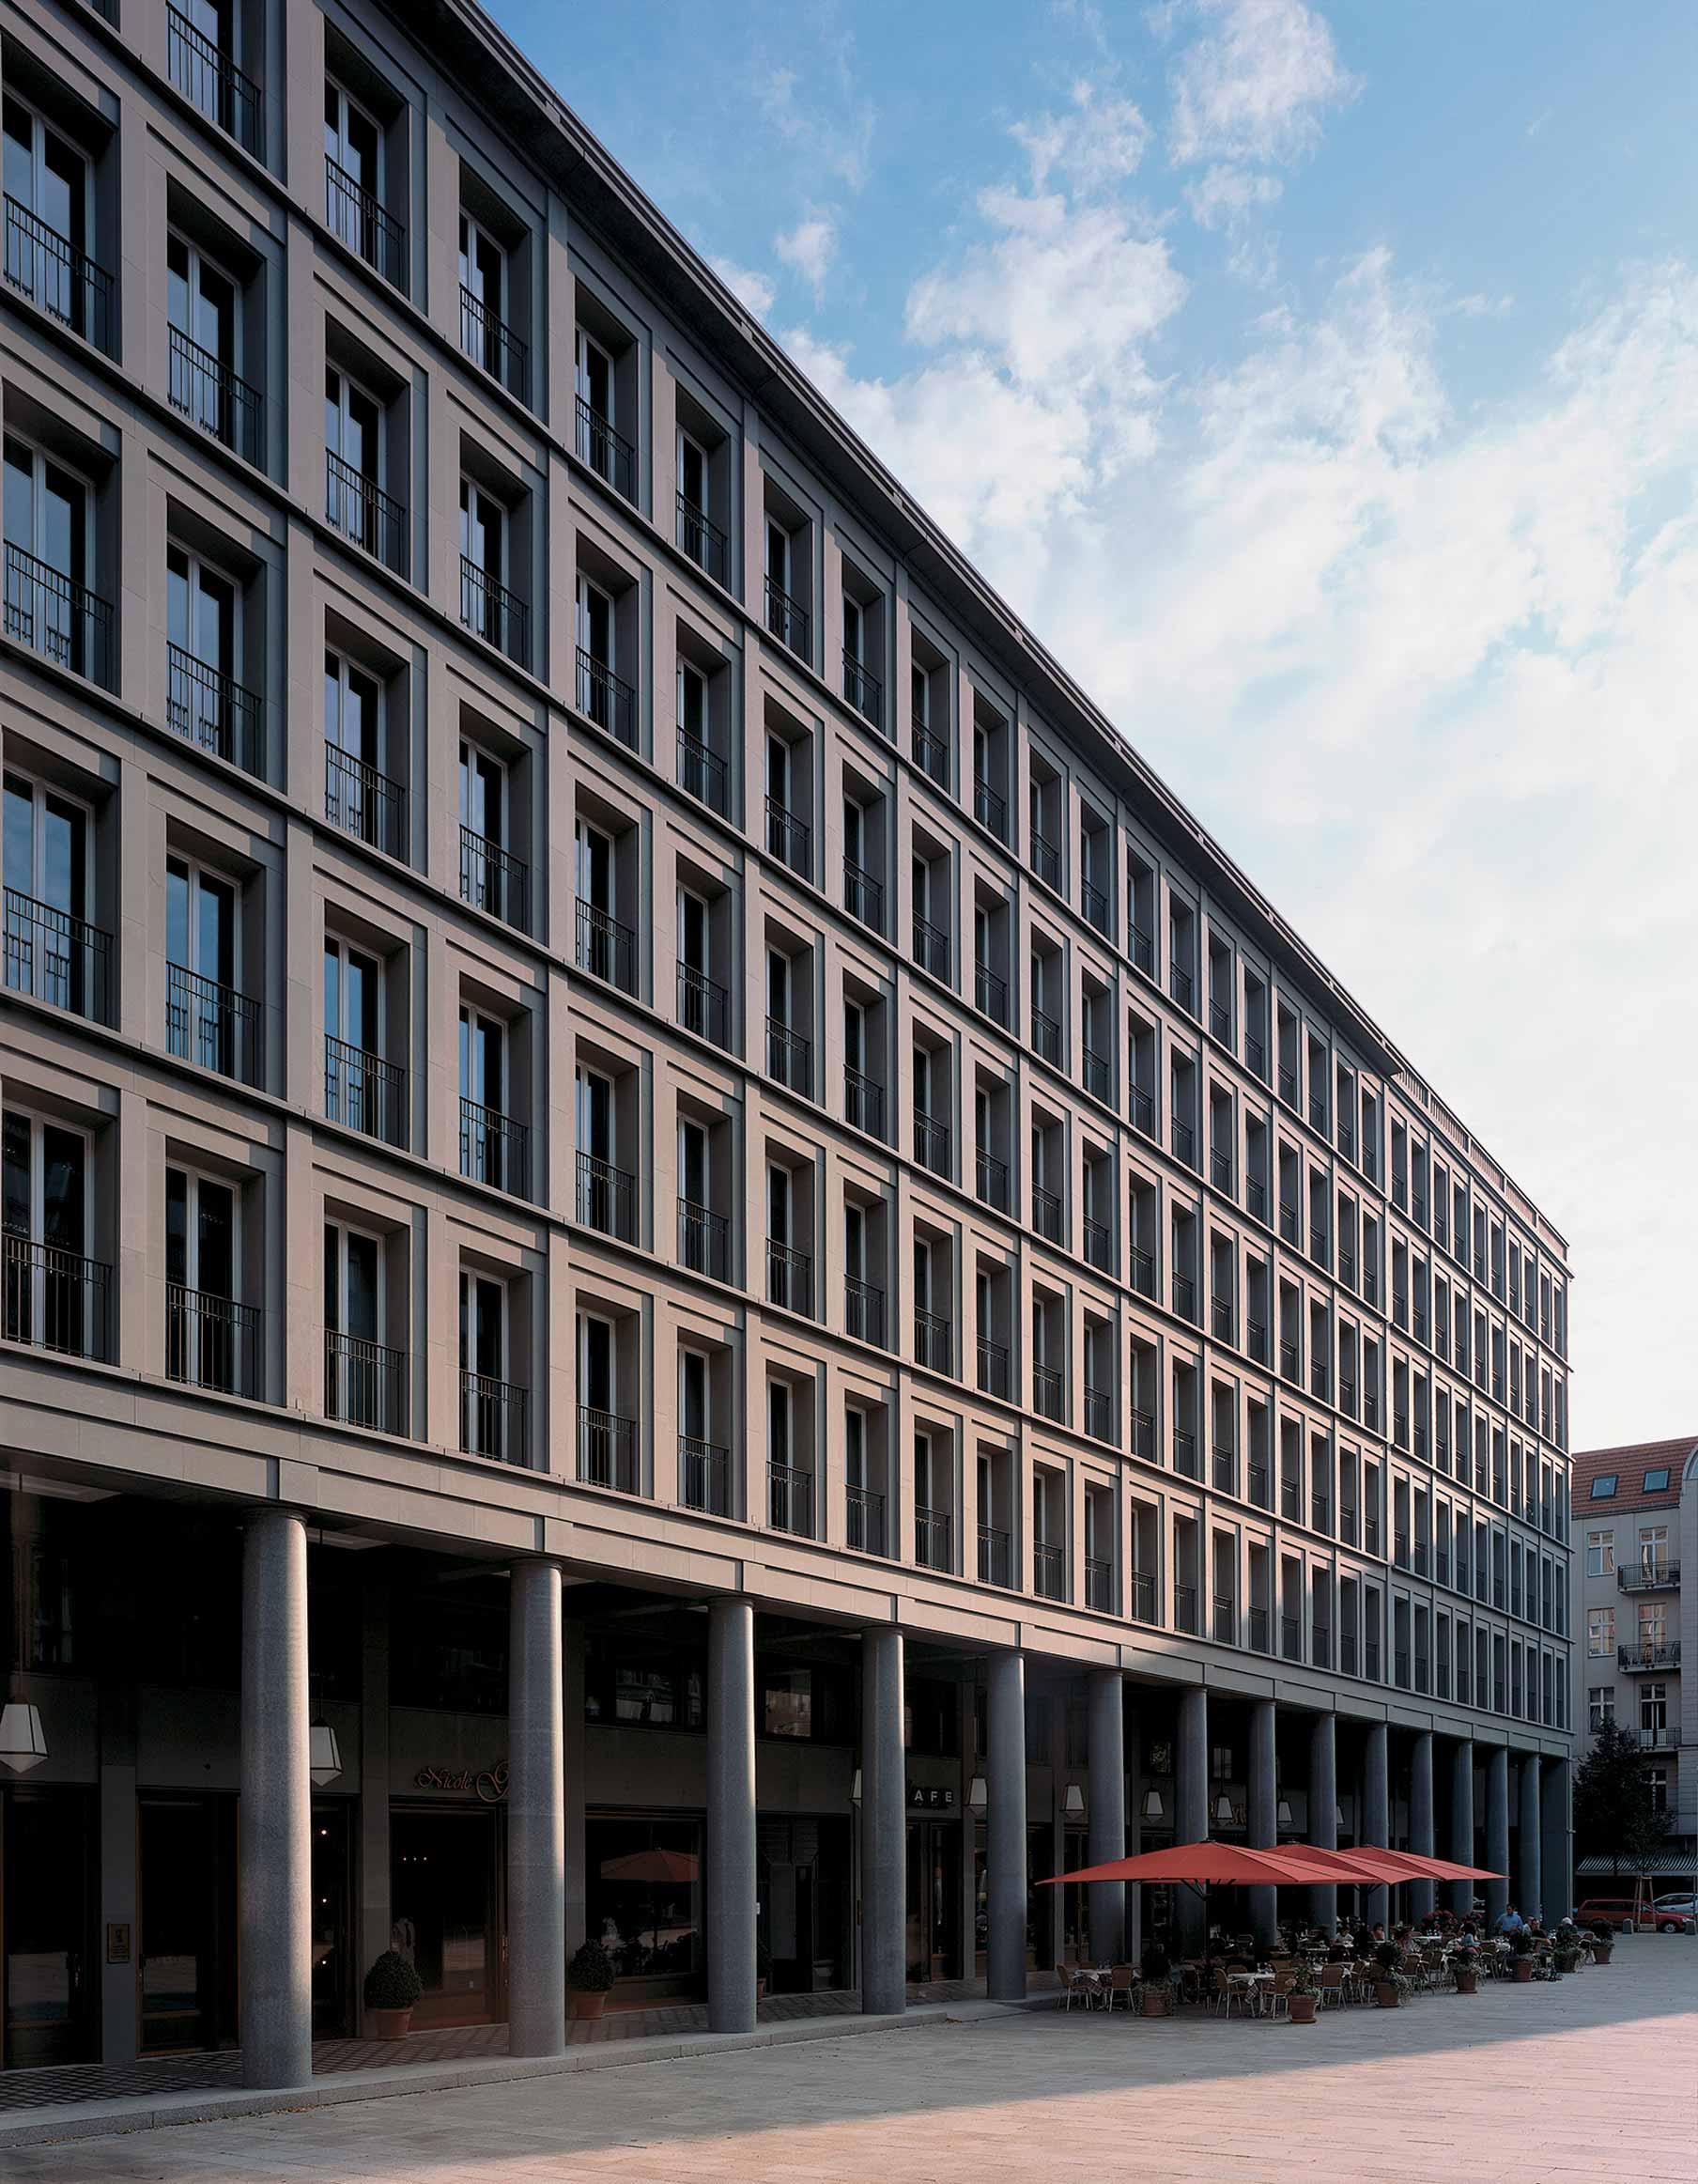 Edificio Walter-Benjamin-Platz Kollhoff